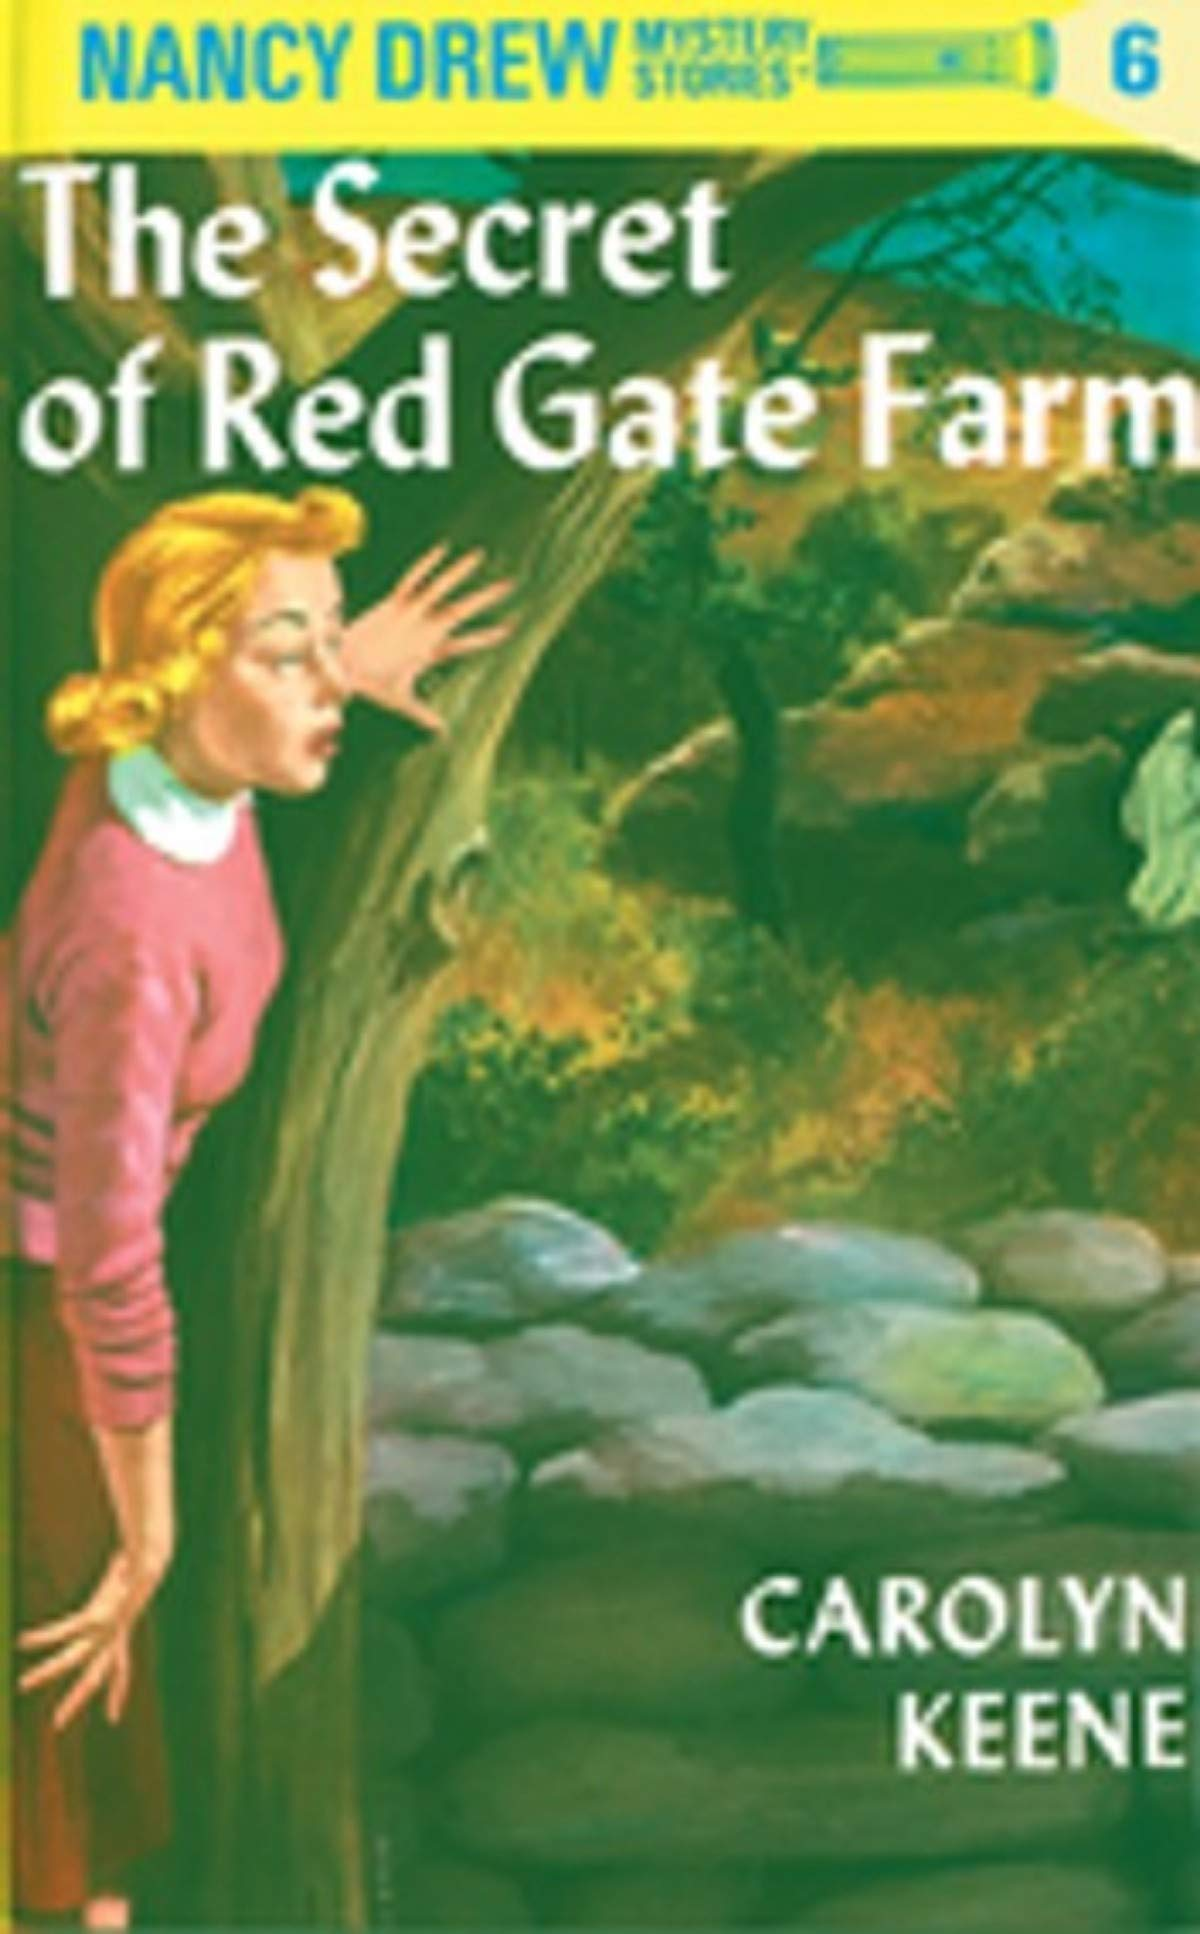 The Secret of Red Gate Farm: (Nancy Drew Mystery #6)